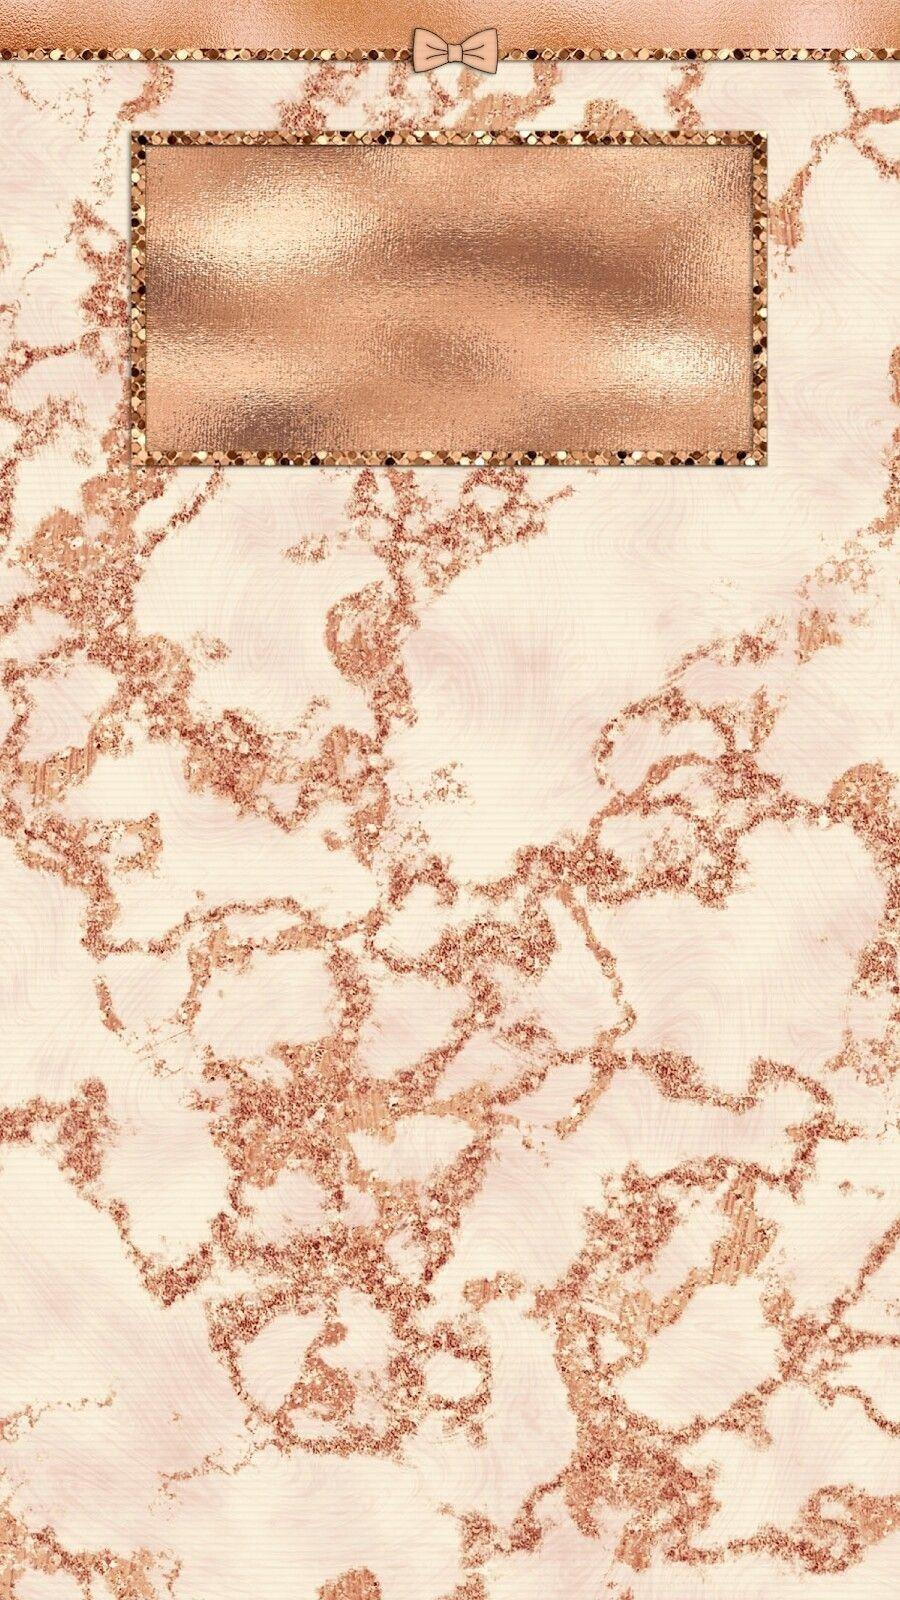 Pin By G J Singh On Grafic Designs Locked Iphone Wallpaper Pretty Wallpaper Iphone Locked Wallpaper